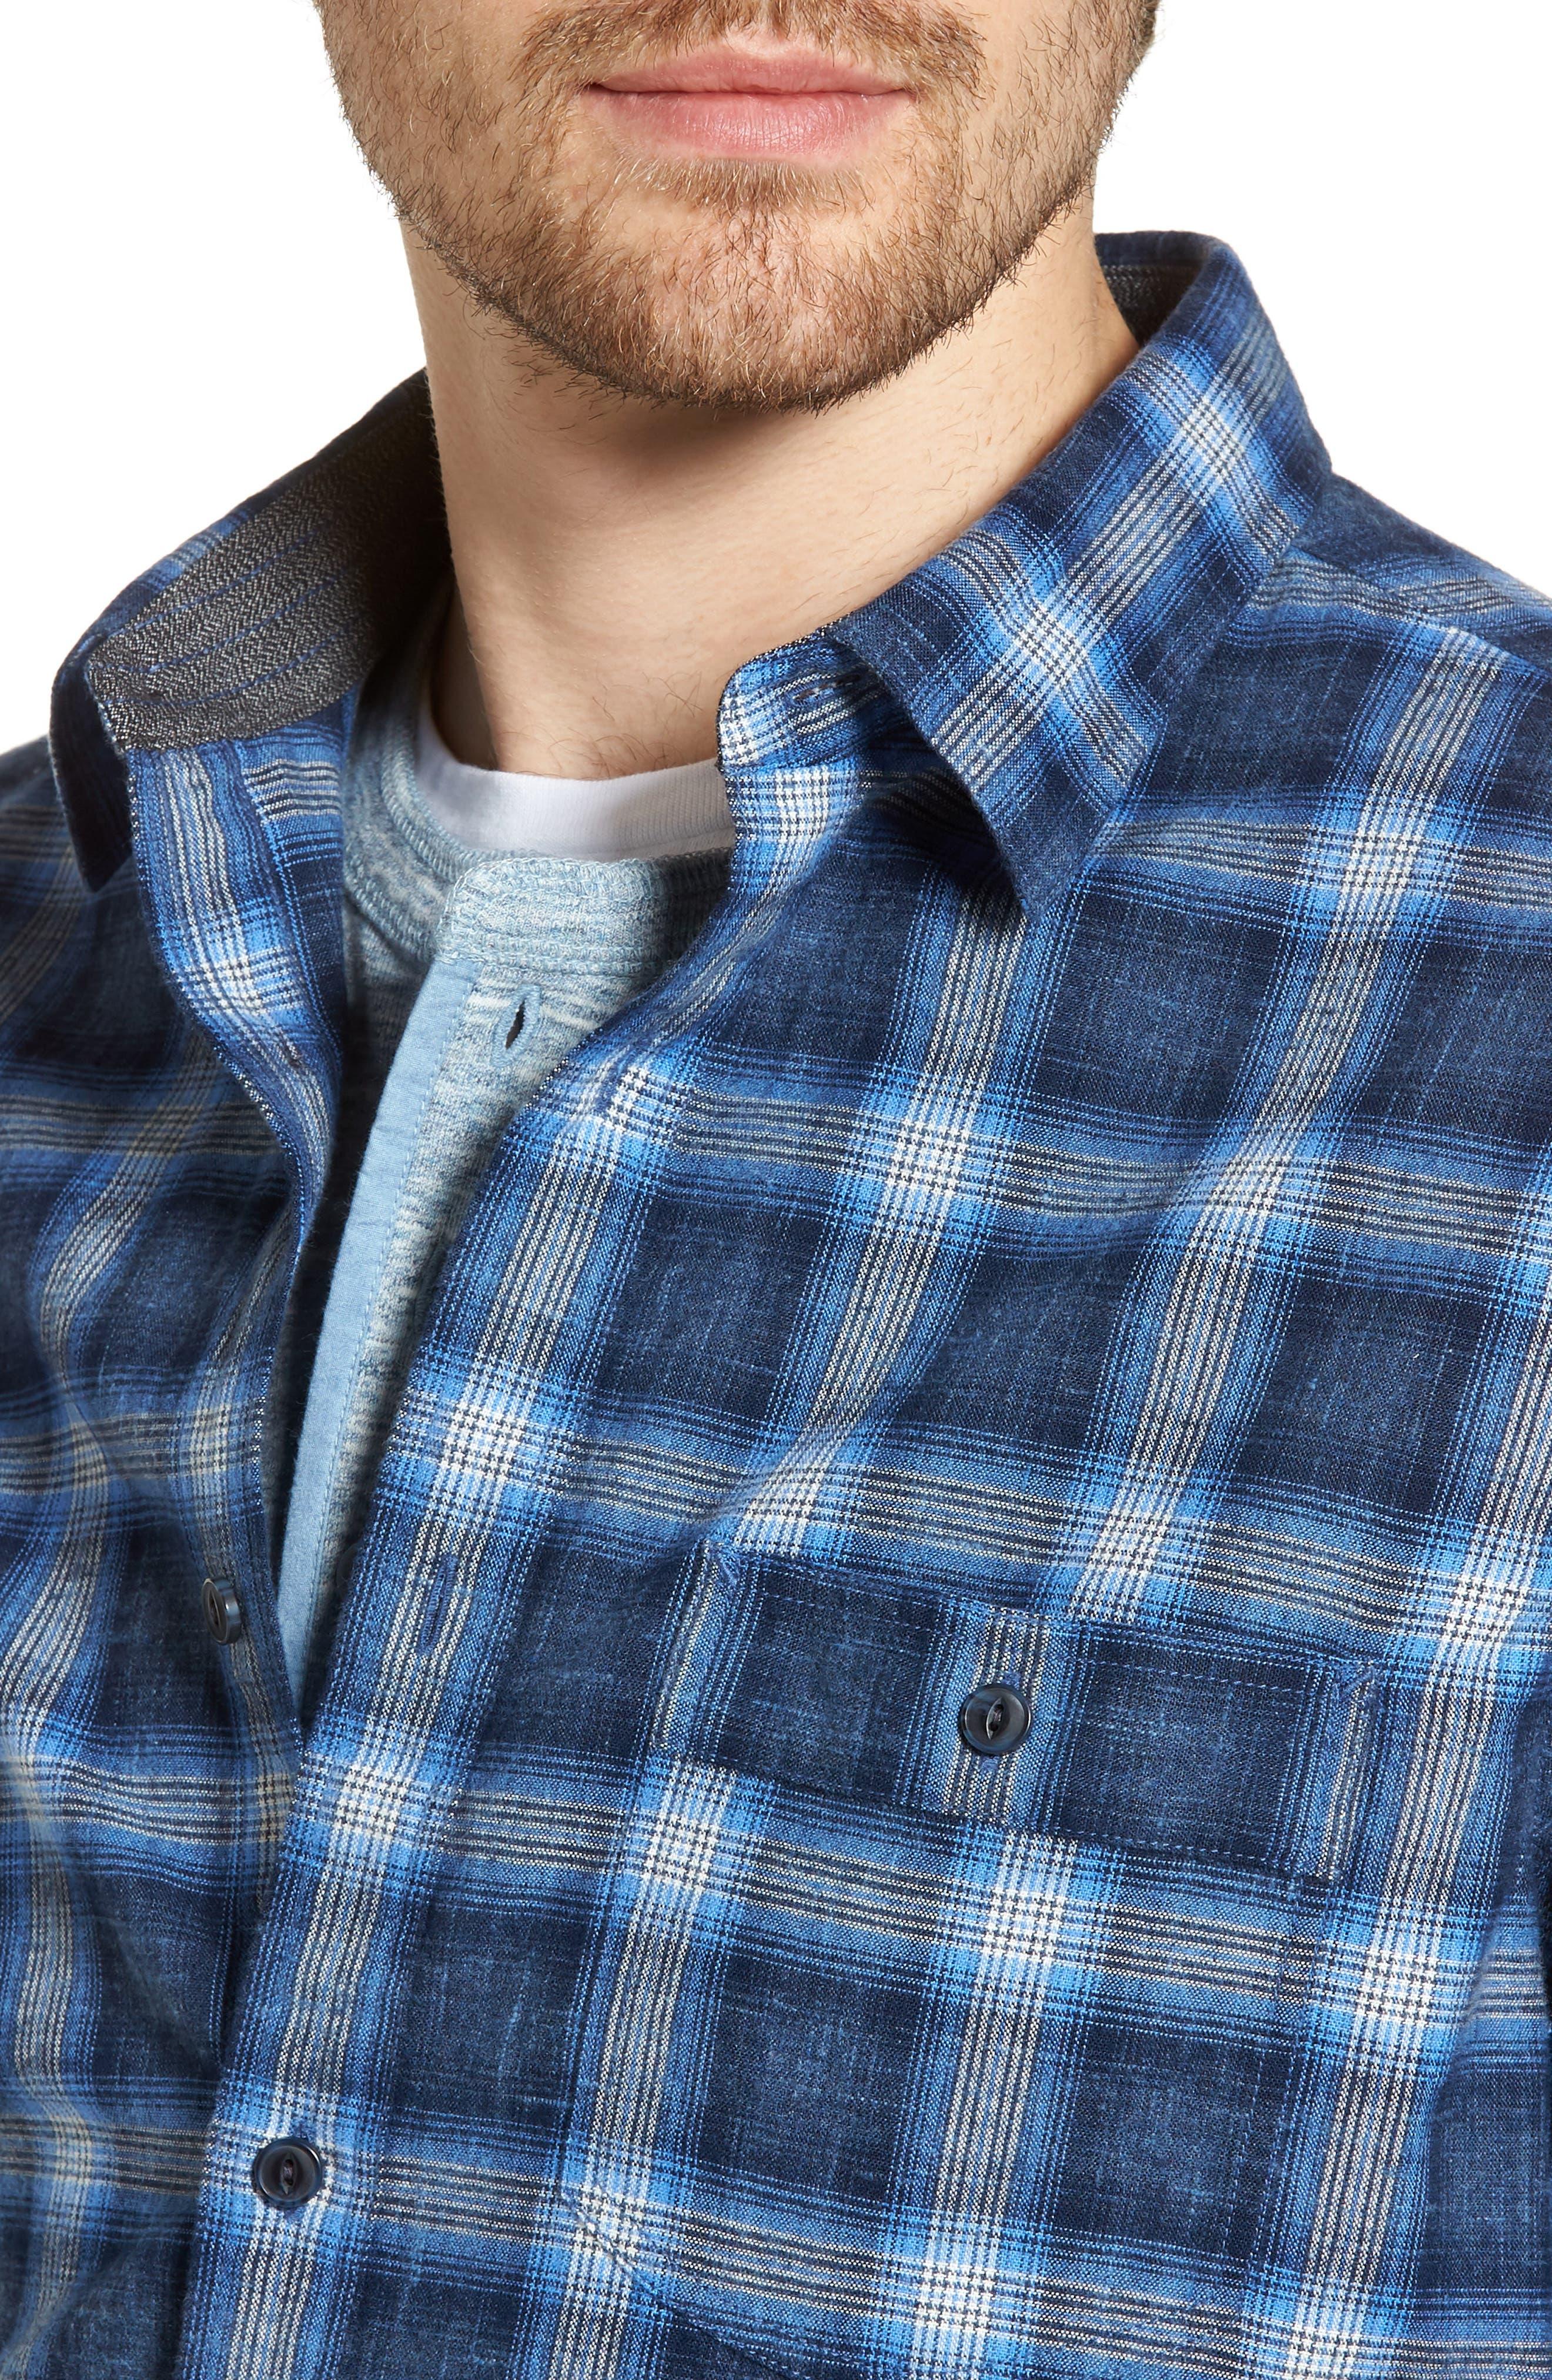 Trim Fit Plaid Sport Shirt,                             Alternate thumbnail 2, color,                             Black Blue Homespun Plaid